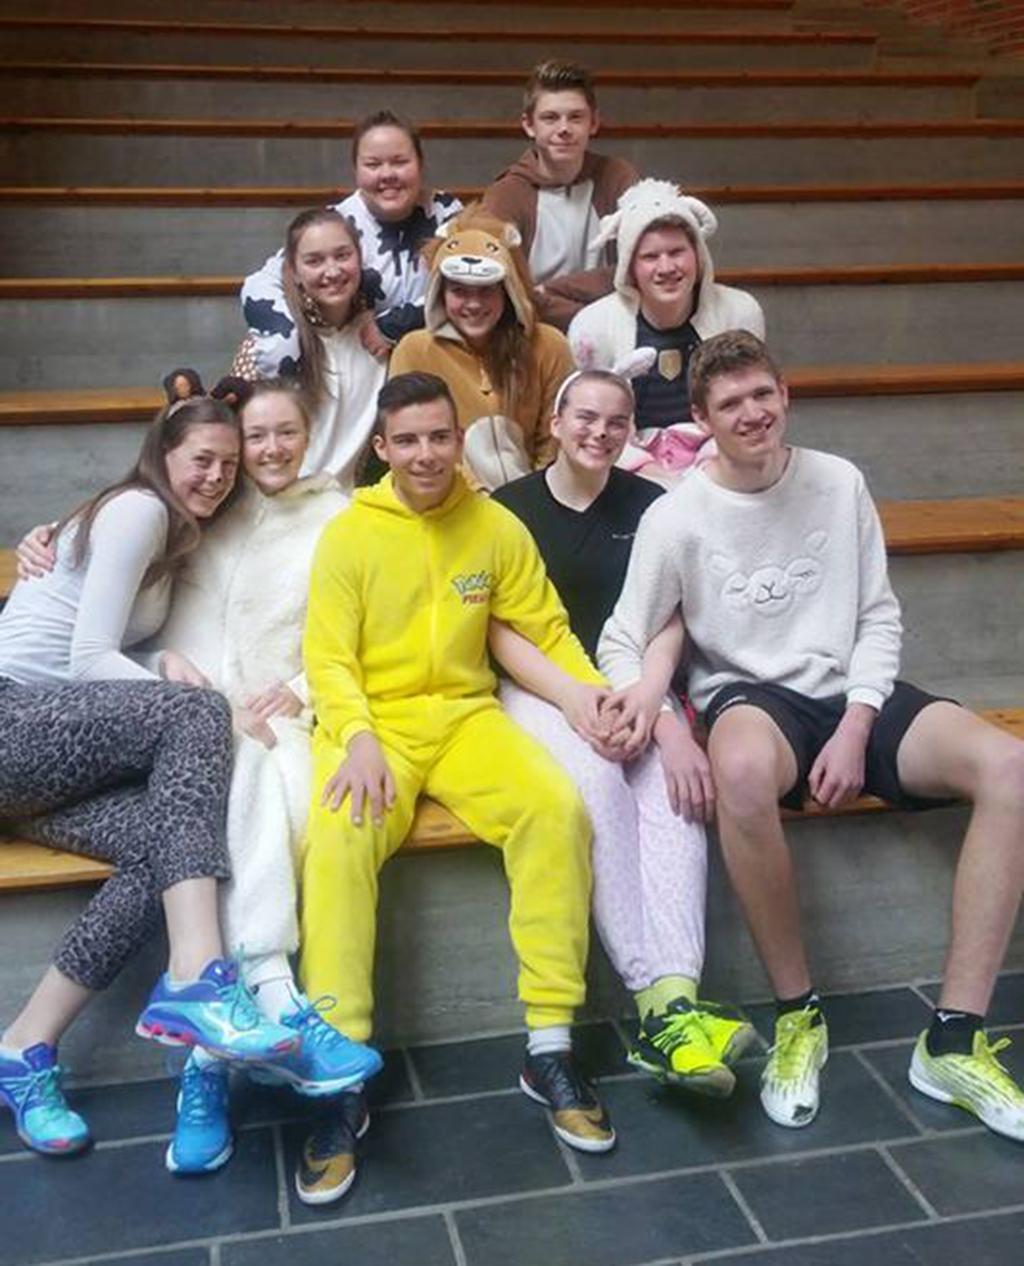 Beste kostyme på aktivitetsdagen, Foto - Ane Birkeland